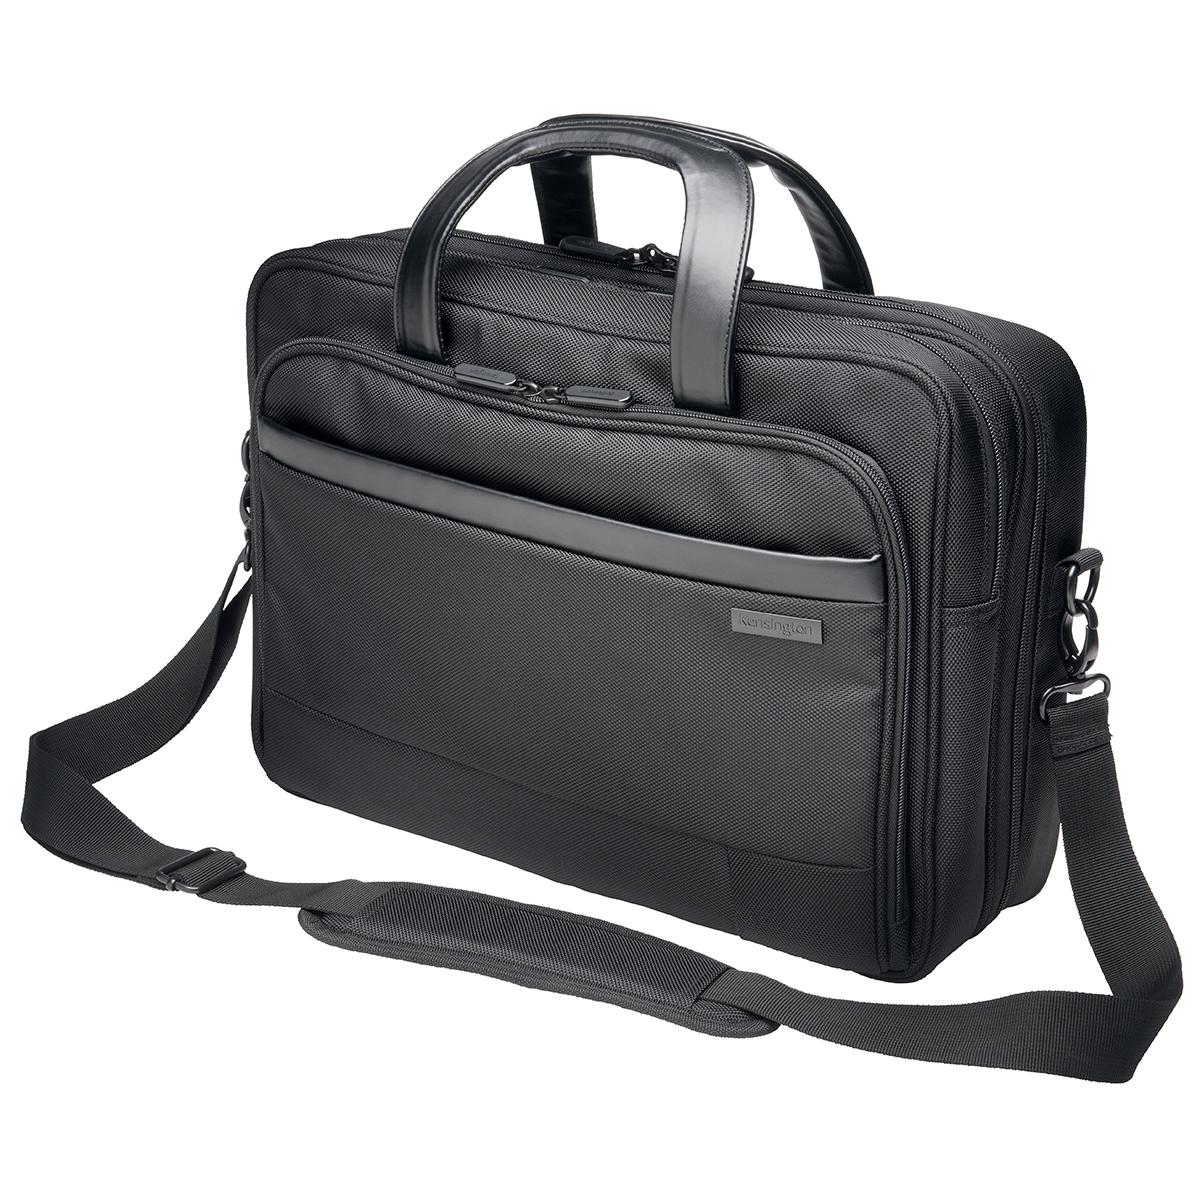 Kensington  K60386EU Contour 2.0 15.6 Inch Briefcase